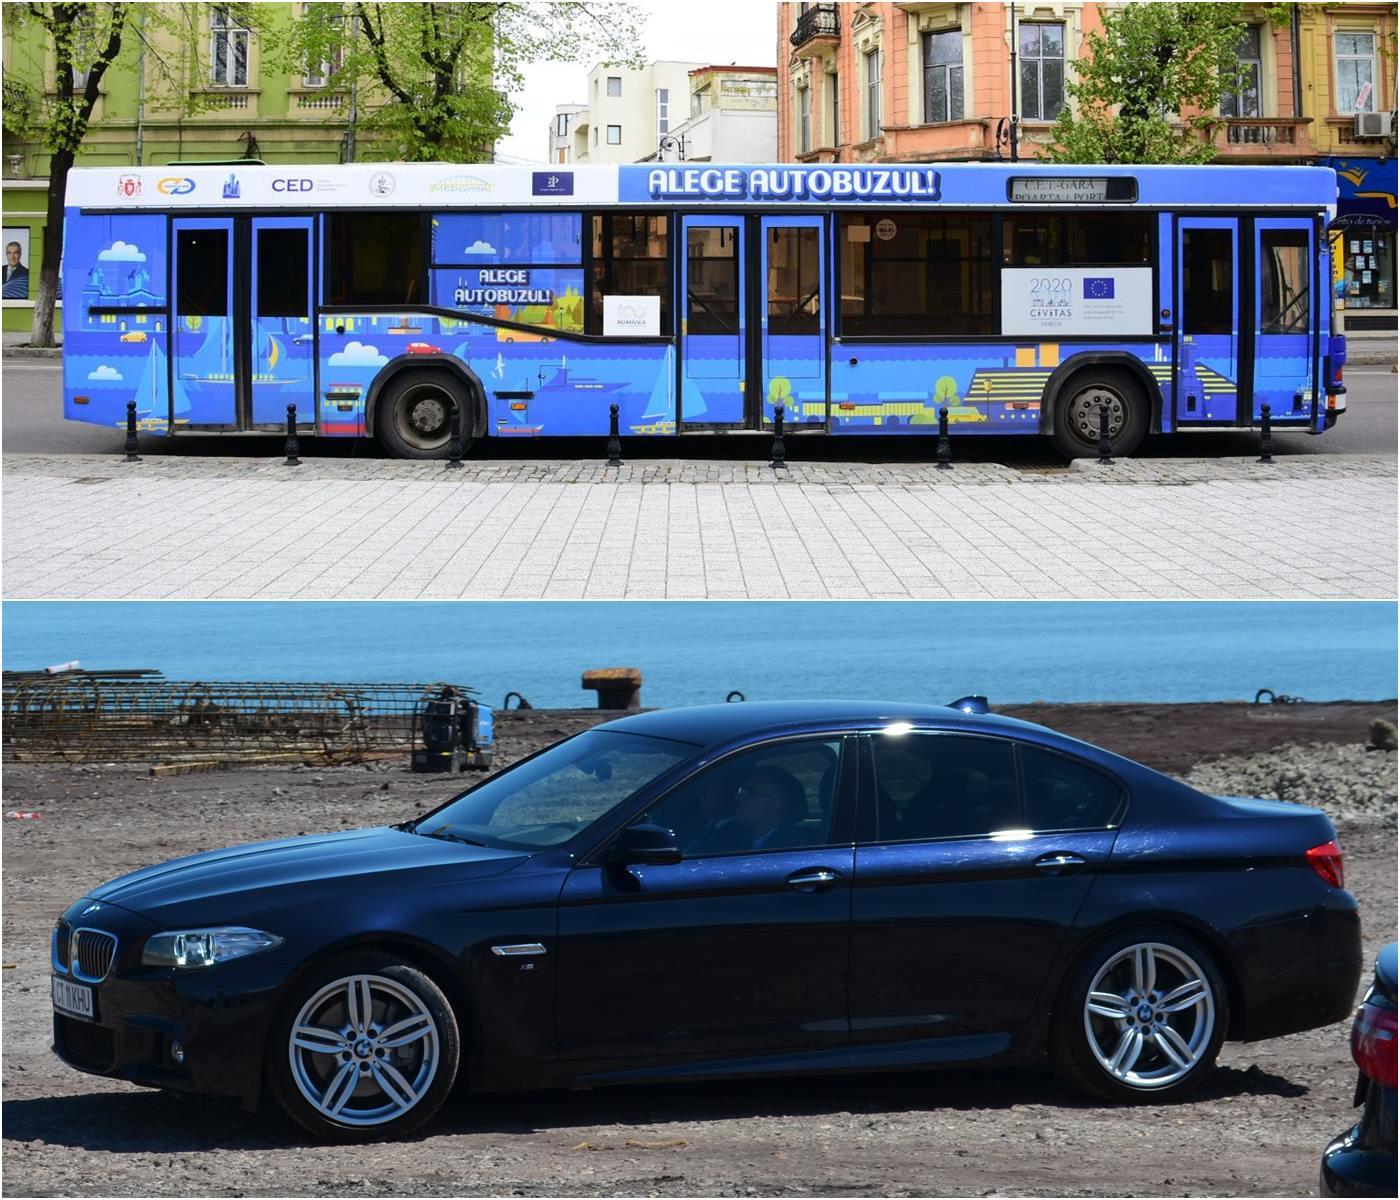 alege autobuzul